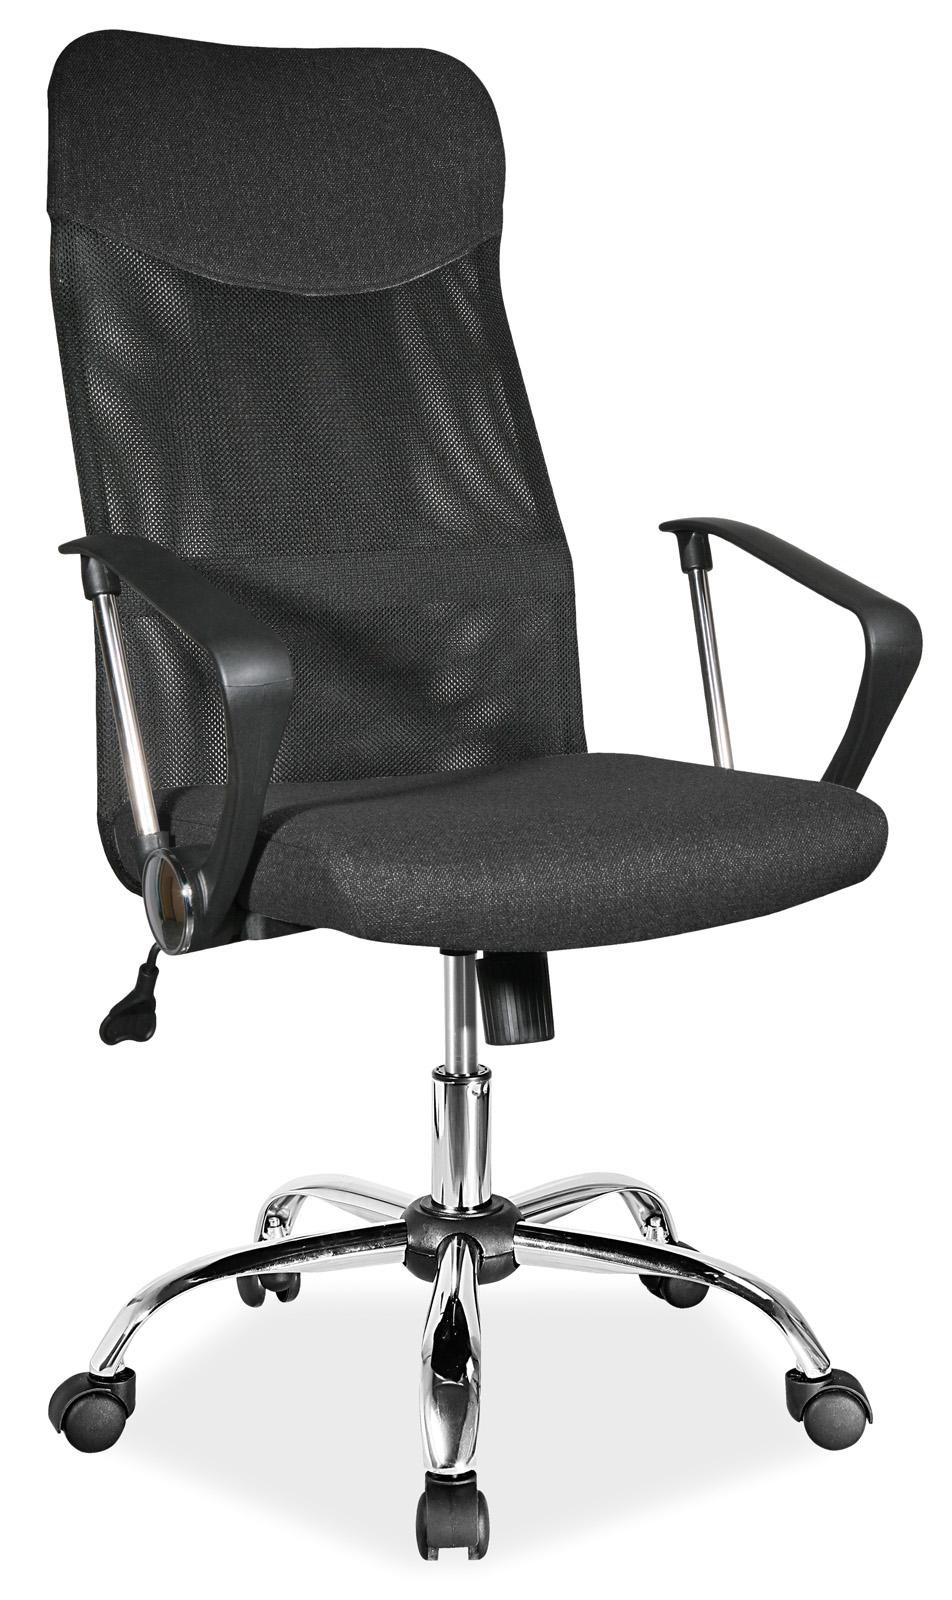 Scaun de birou ergonomic Q-025 Black